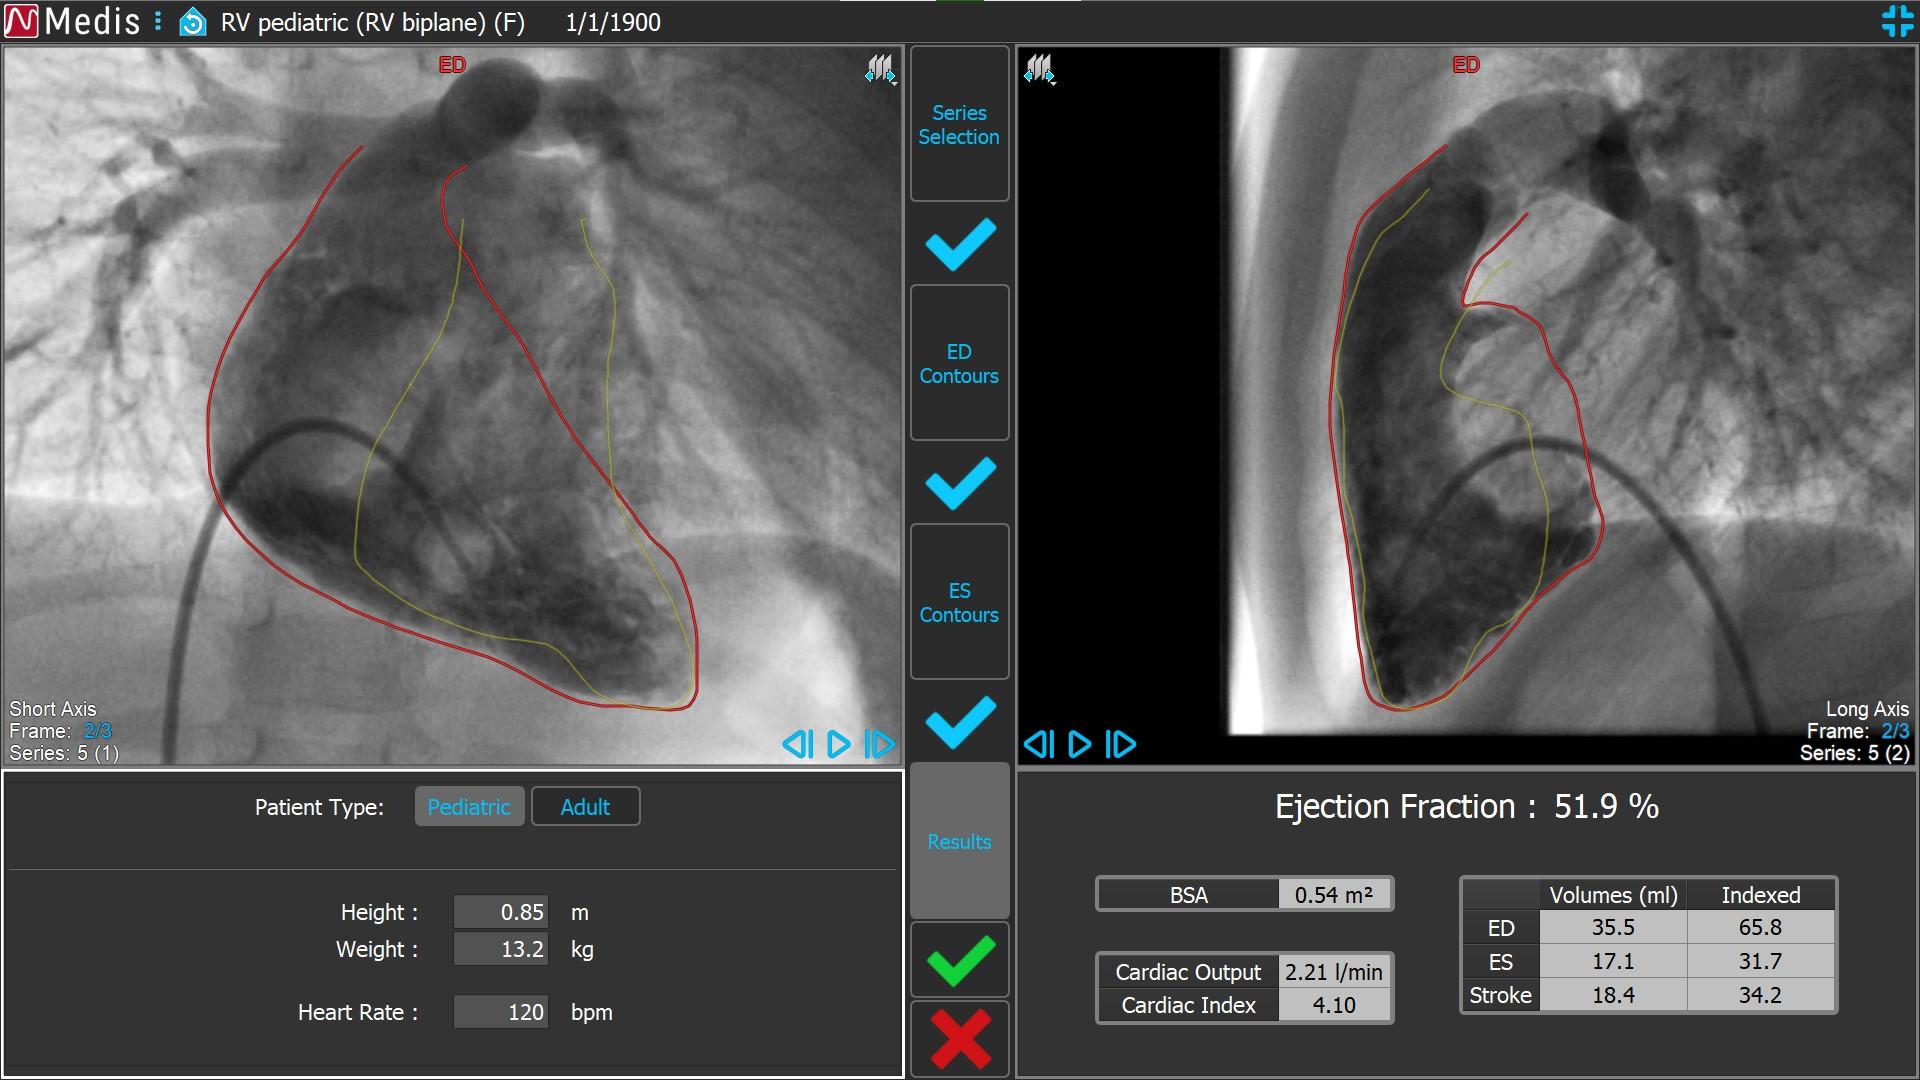 Medis Suite XA RV Biplane 4 Results